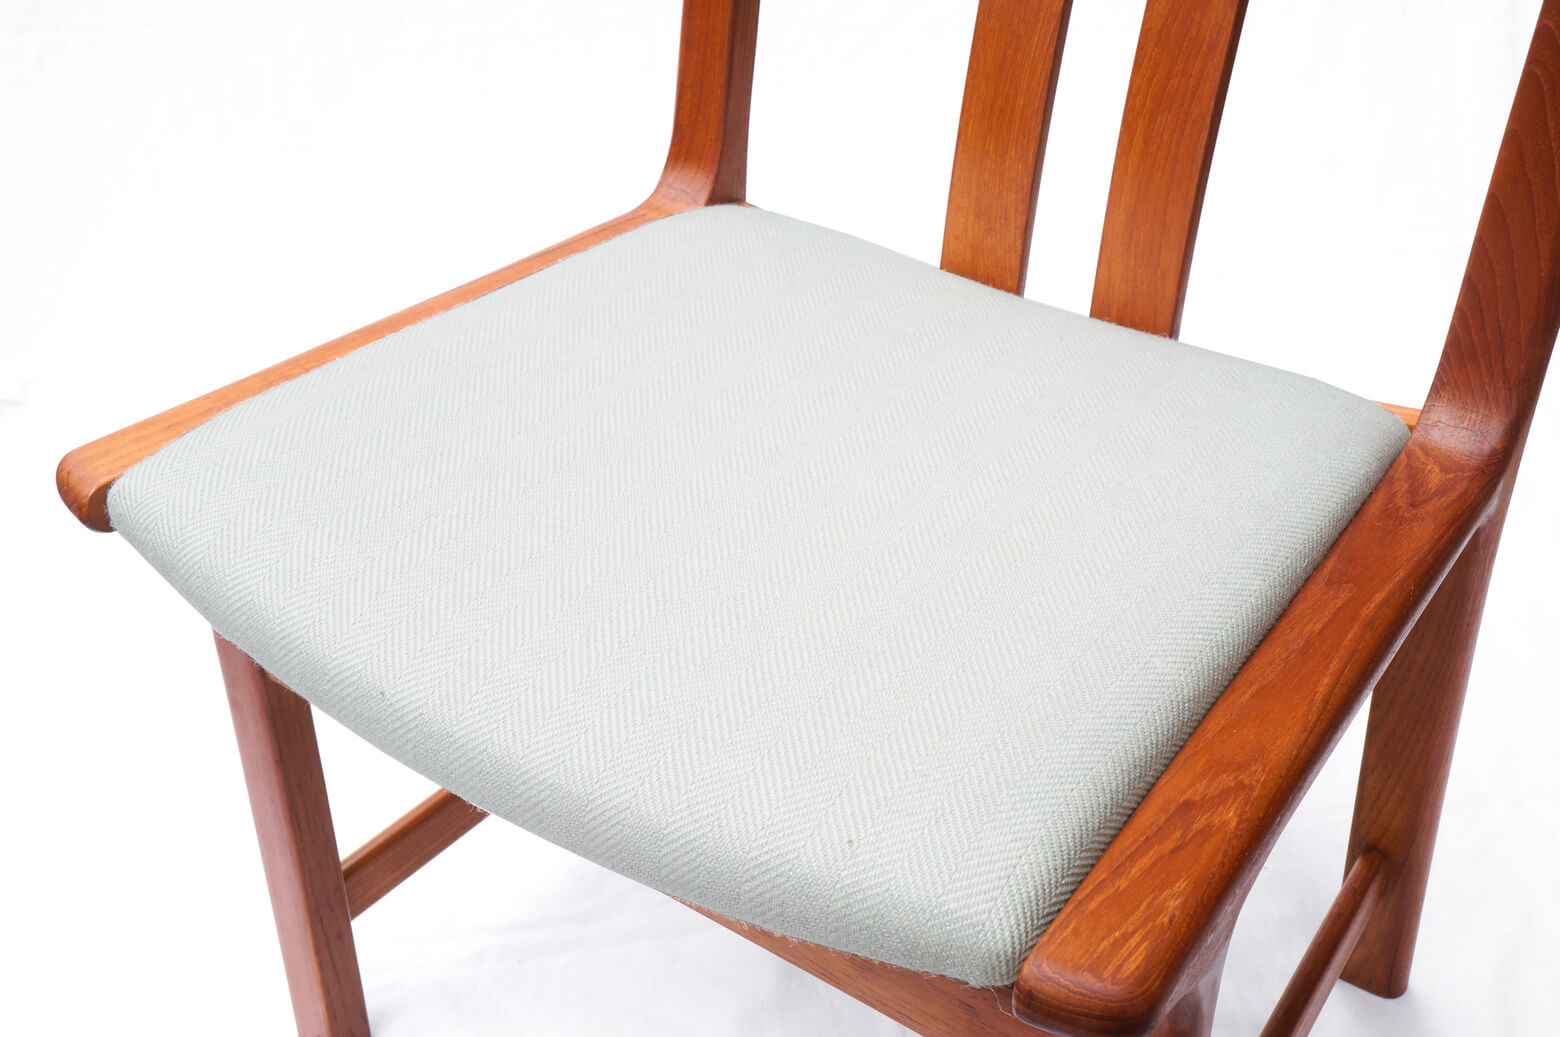 Danish Vintage L.Olsen&Son Dining Chair Re-Covering Herringbone Light Gray/デンマーク ヴィンテージ L.オルセン&サン ダイニング チェア 北欧家具 ヘリンボーン ライトグレー